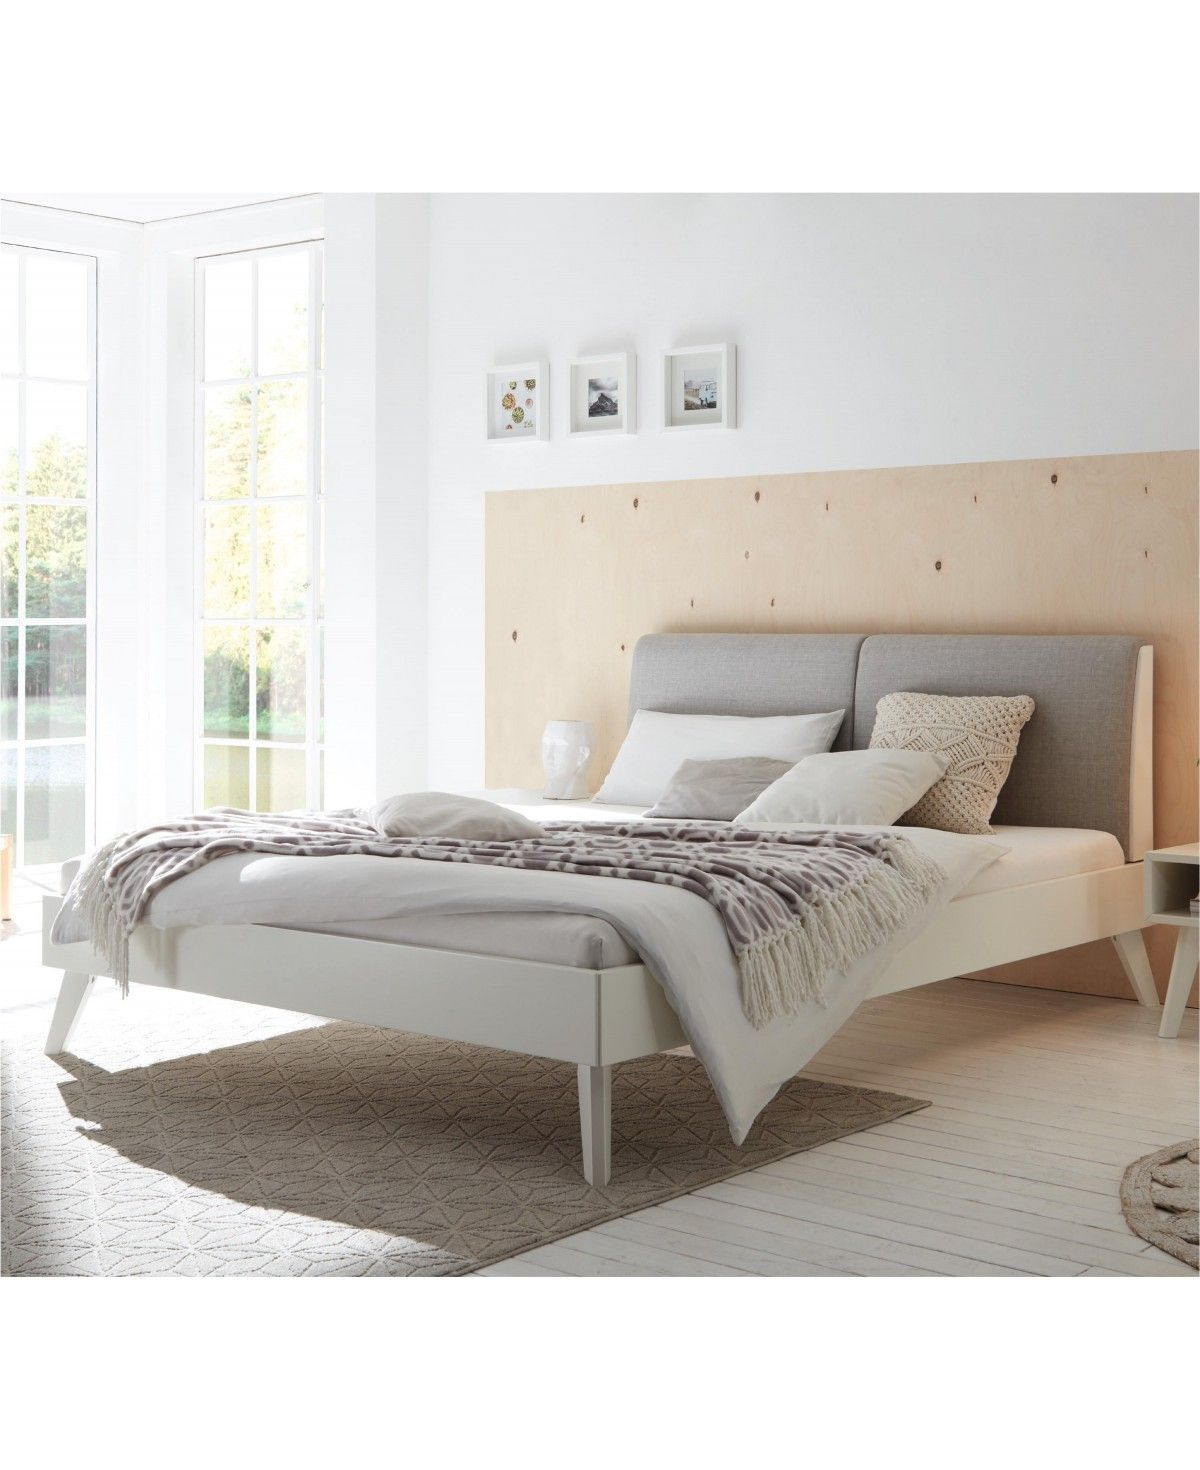 hasena bett simone 20 buche wei deckend polsterkopfteil. Black Bedroom Furniture Sets. Home Design Ideas